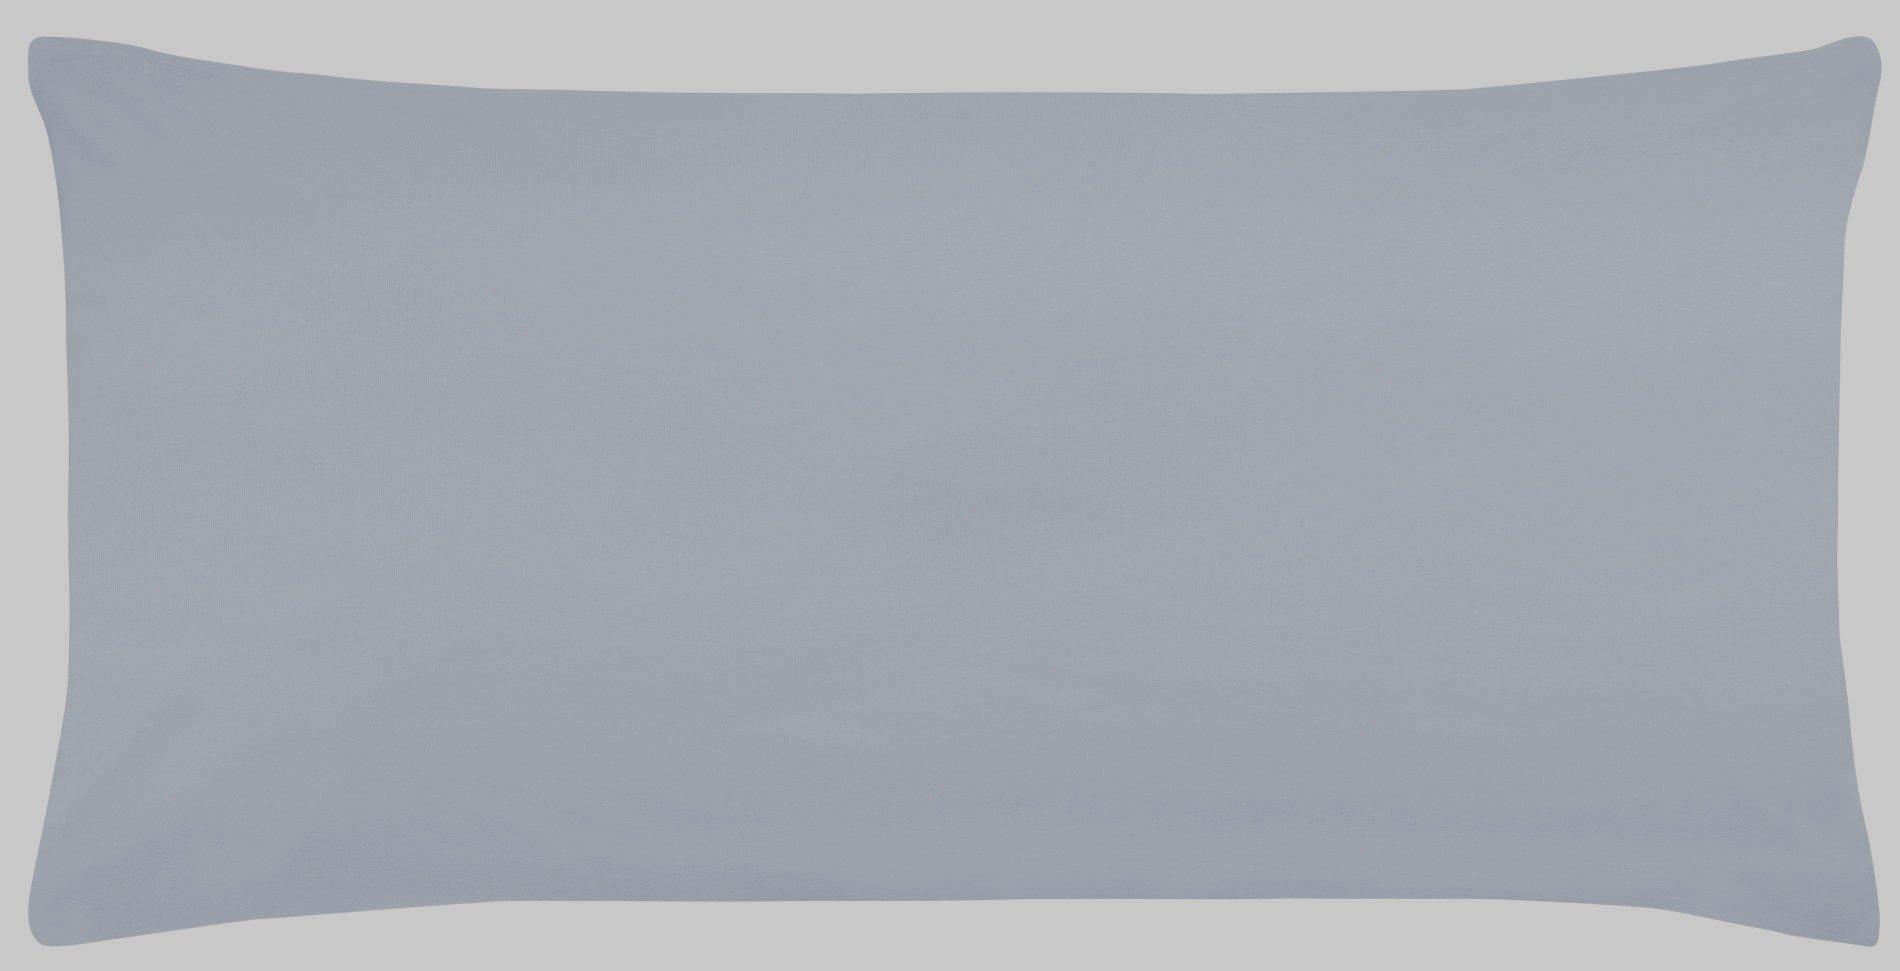 K.-Bezug eisblau 40x80cm